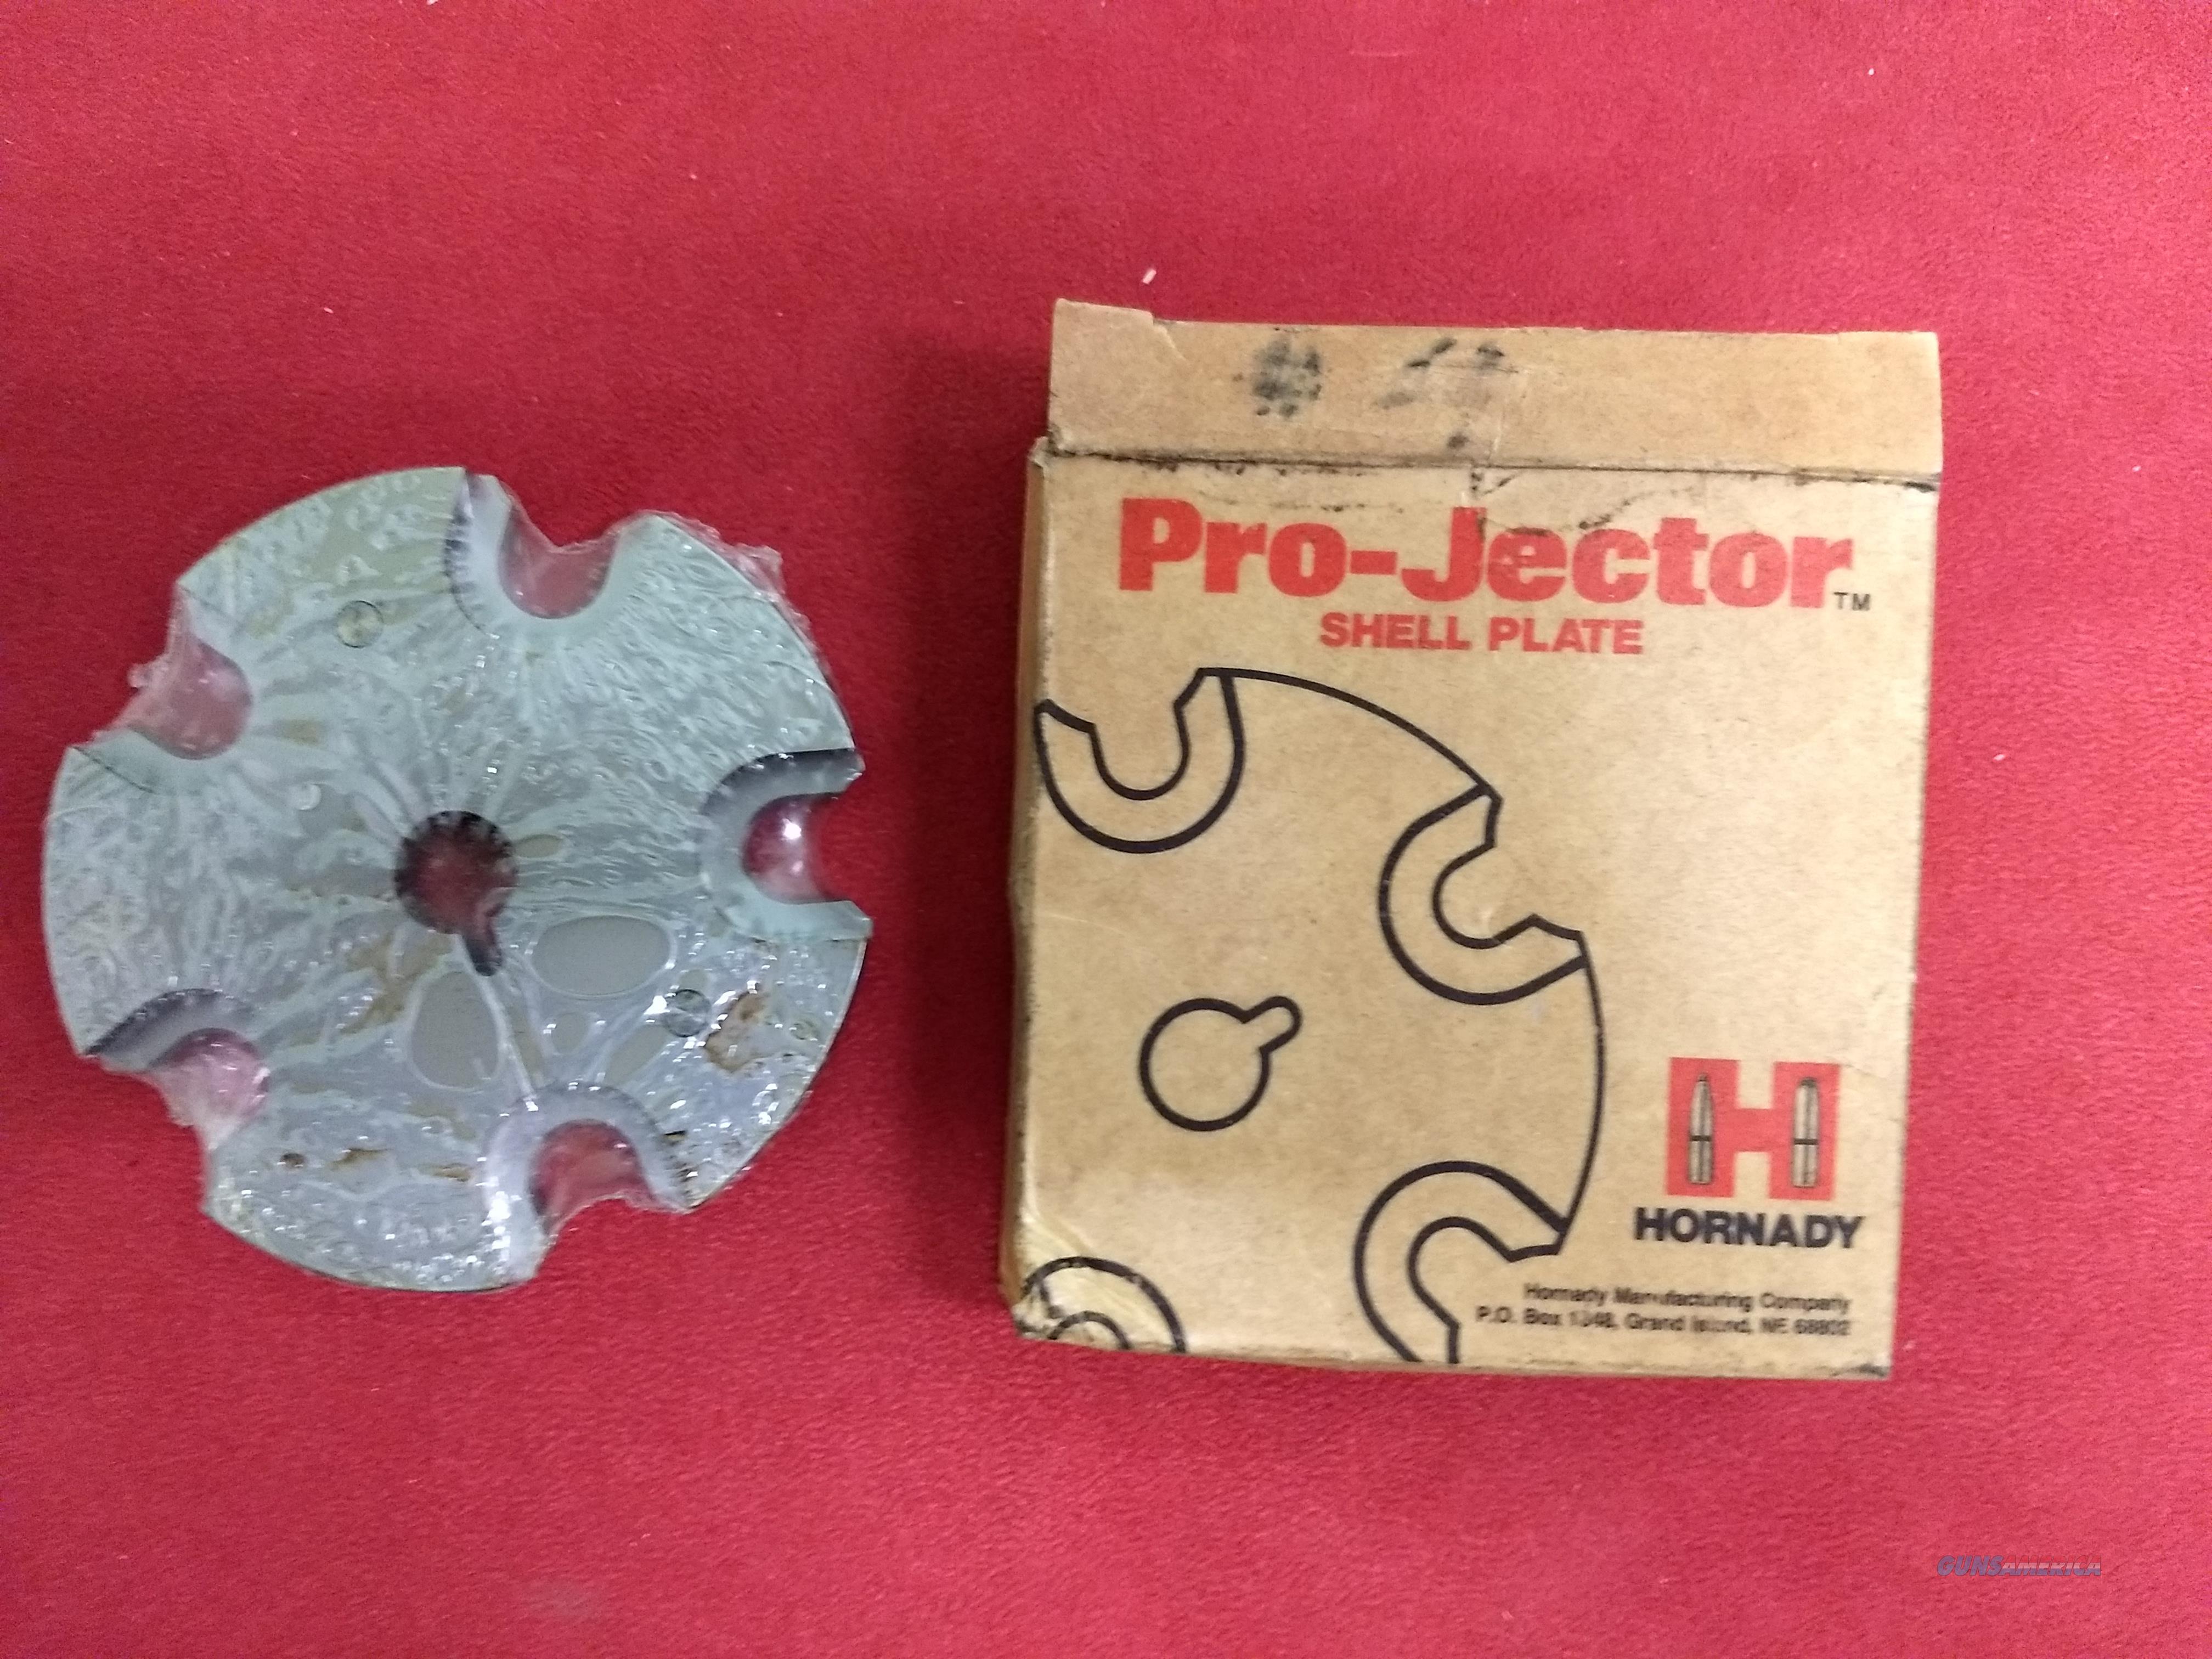 Hornady Pro-Jector Press #4 Shell Plate, NIB  Non-Guns > Reloading > Equipment > Metallic > Misc